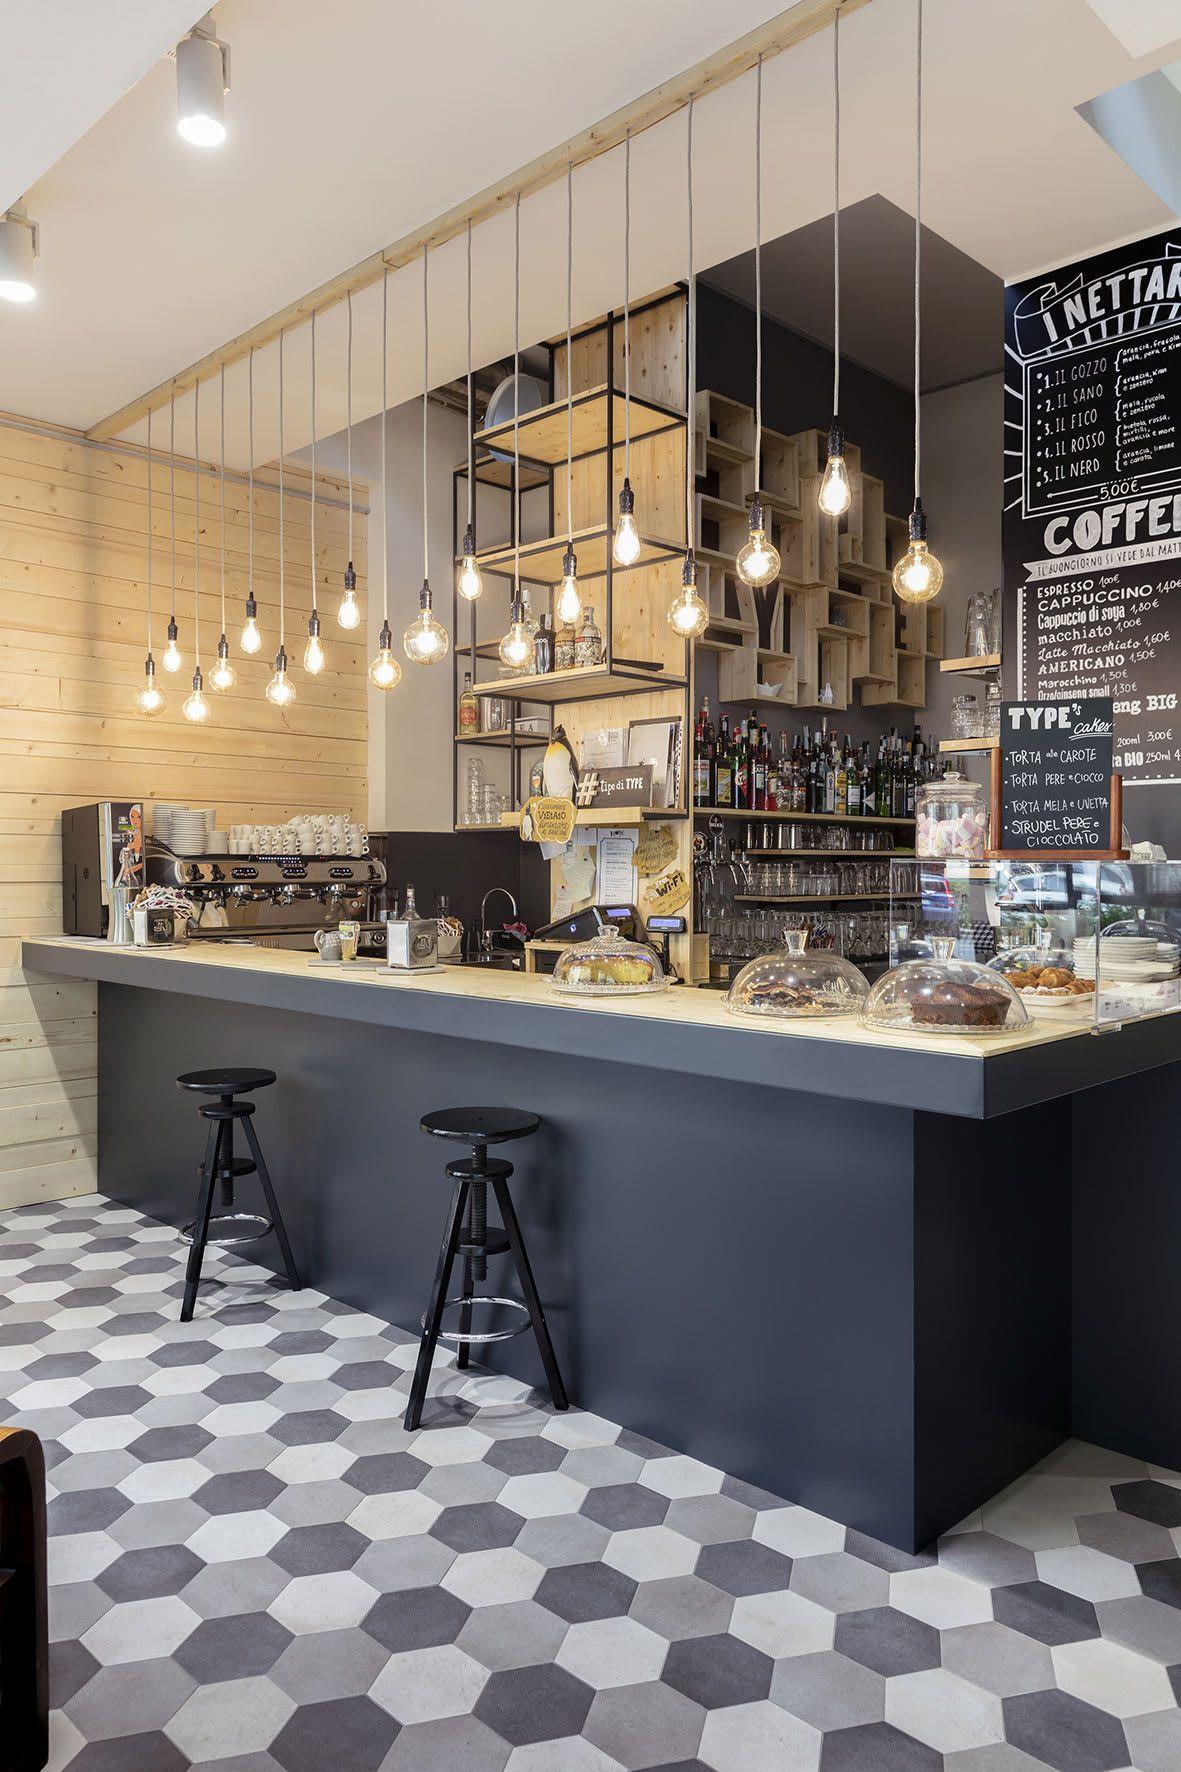 MARGSTUDIO · TYPE · Divisare | Cafe interior design, Coffee shop interior design, Coffee shops ...